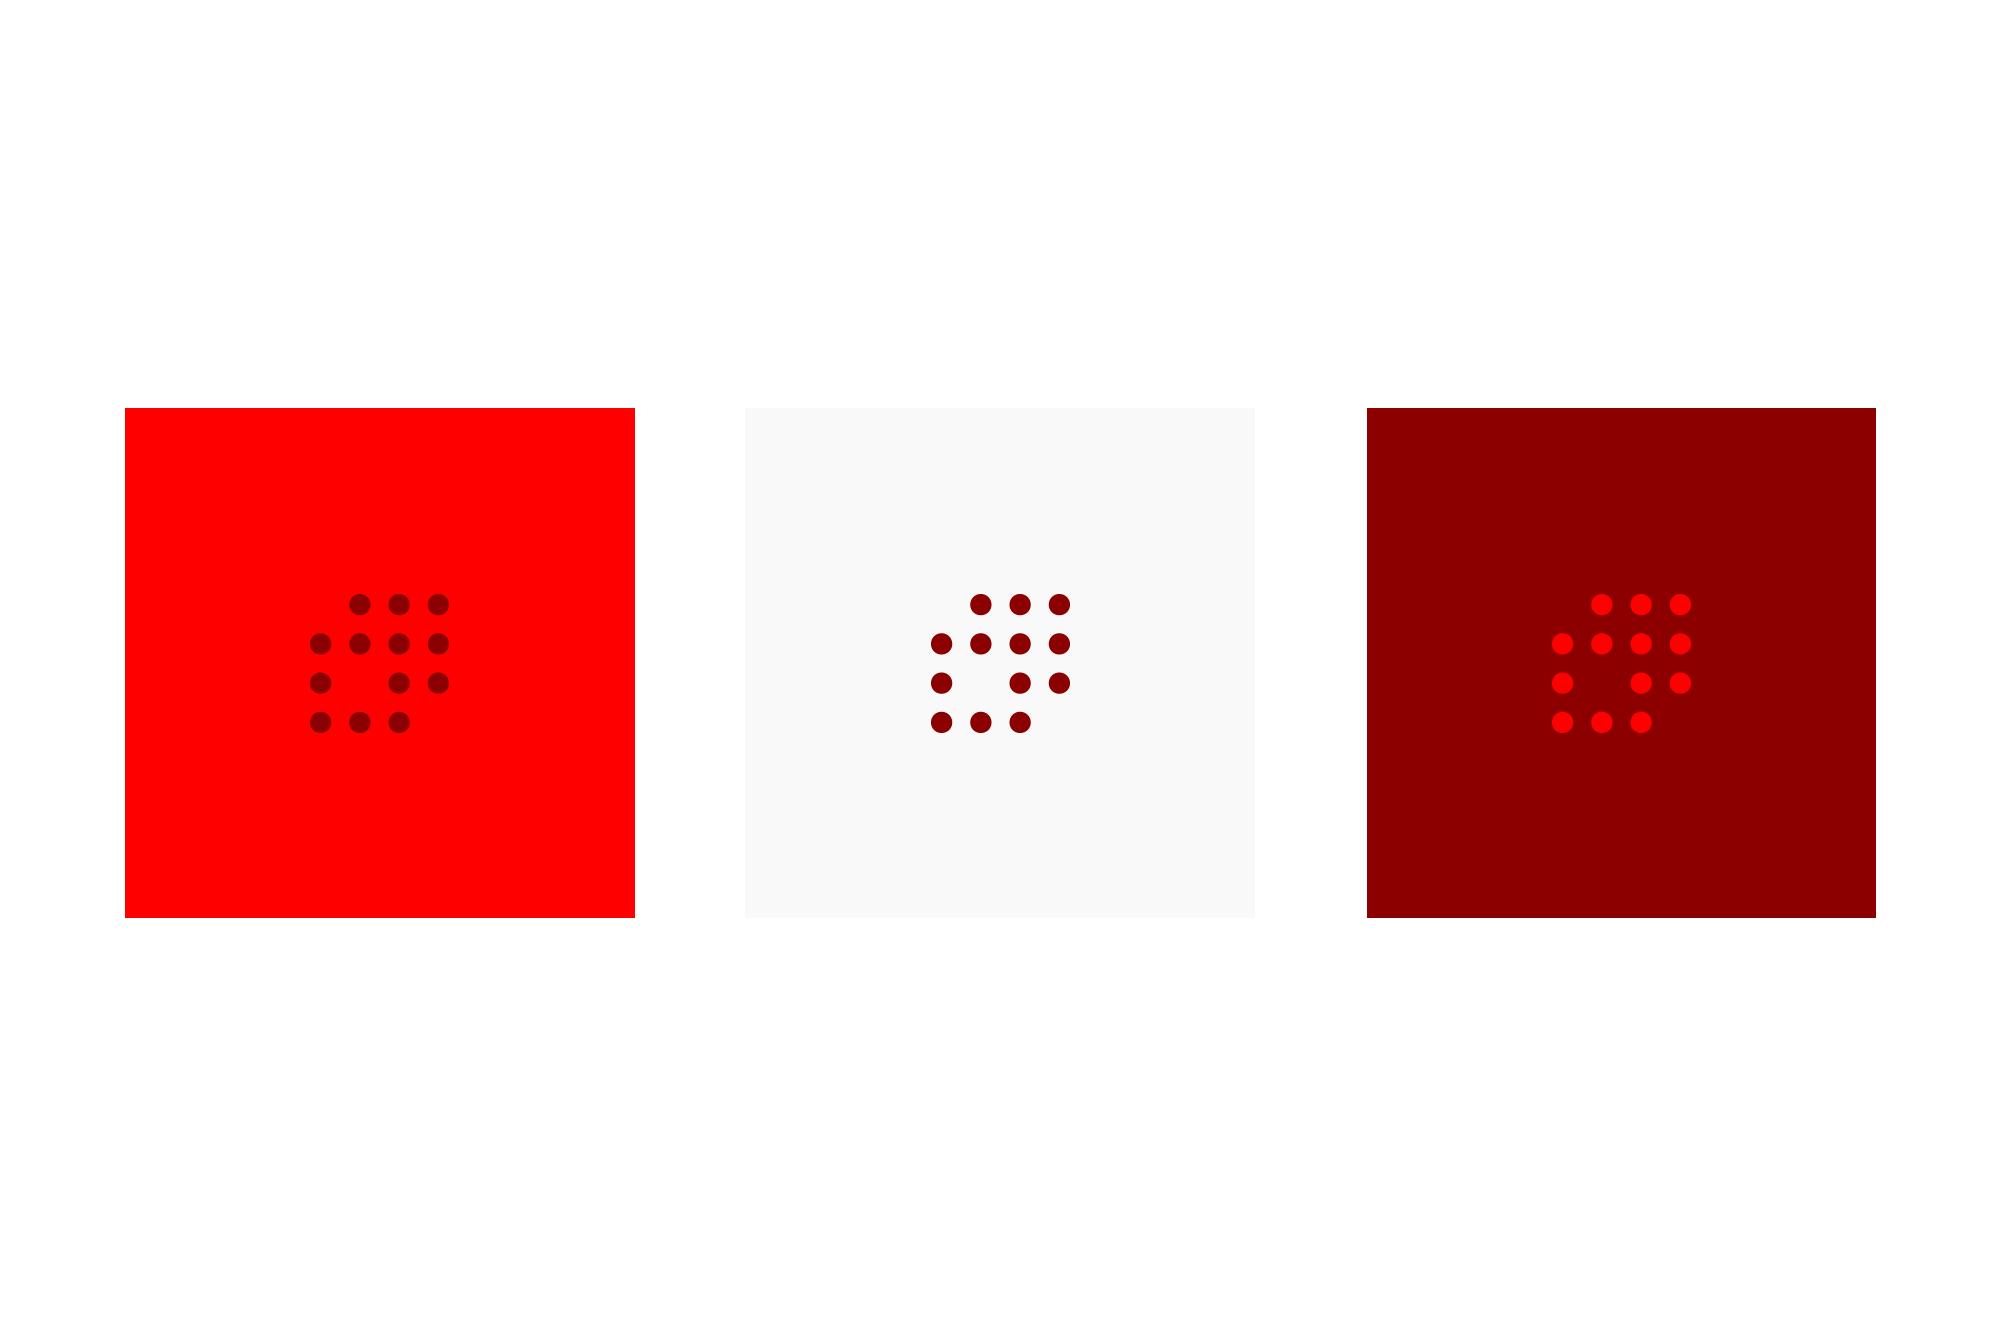 raniev-rod-alvarez-diseño-gráfico-queretaro-iqbit-12-symbol